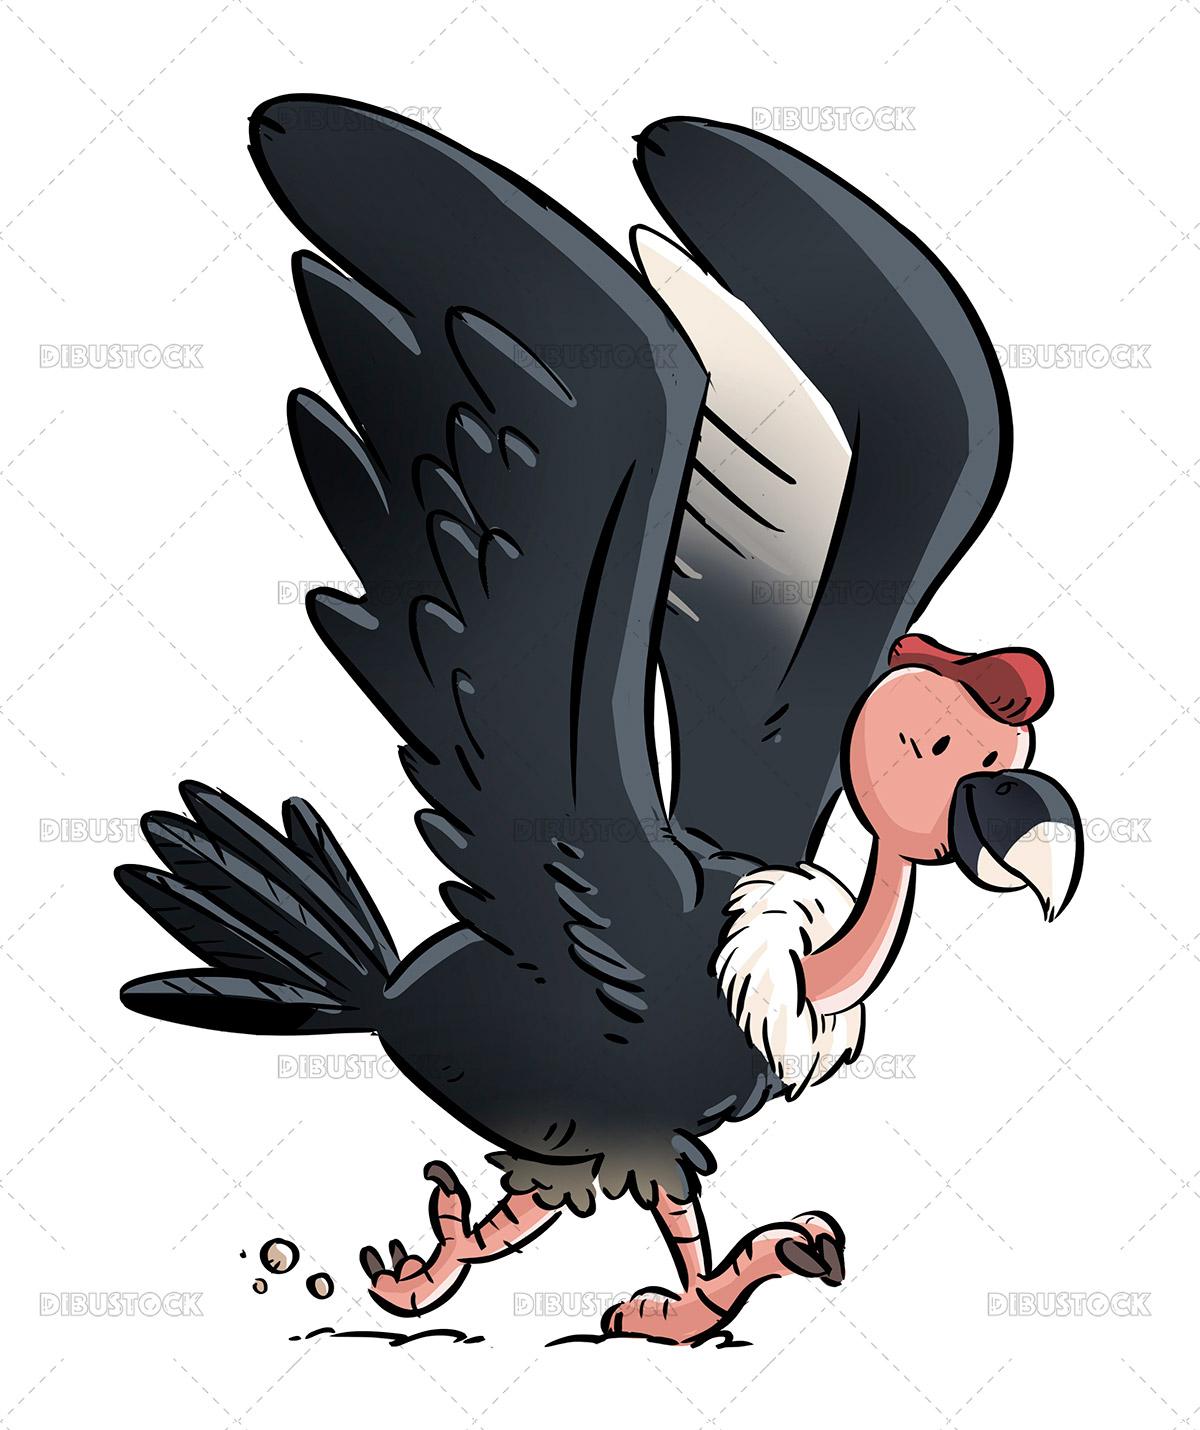 Condor illustration for children